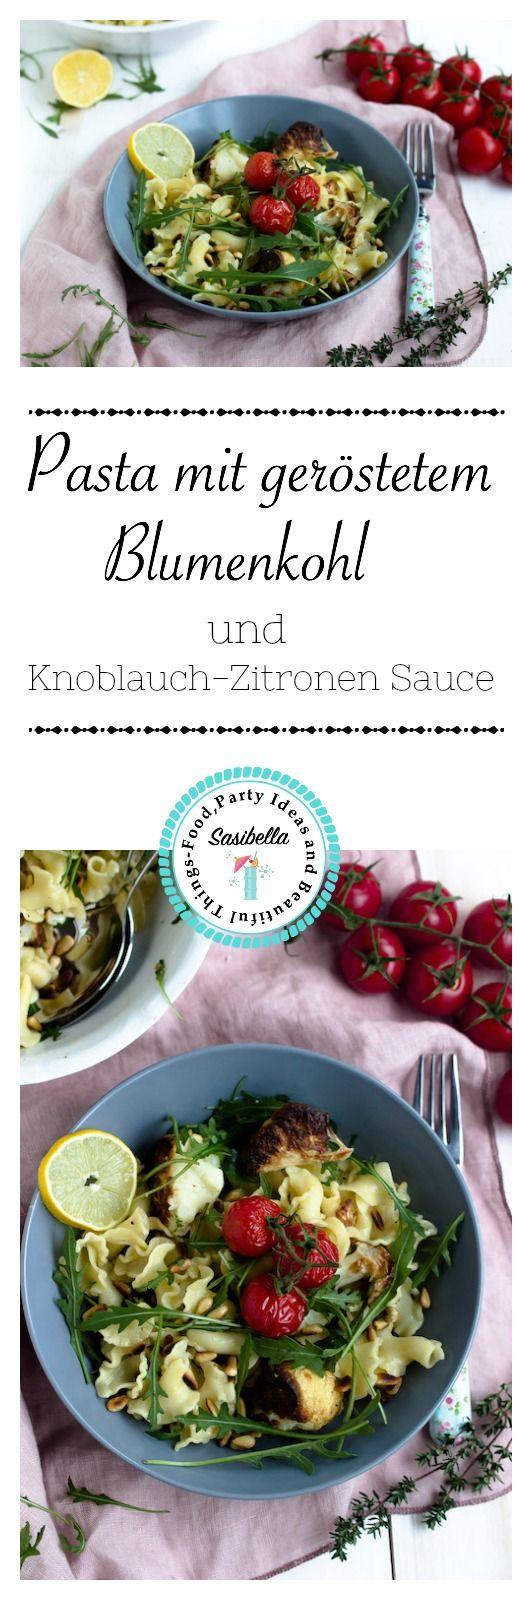 Pasta mit geröstetem Blumenkohl und Knoblauch-Zitronensauce - Pastaliebe im Januar - Sasibella